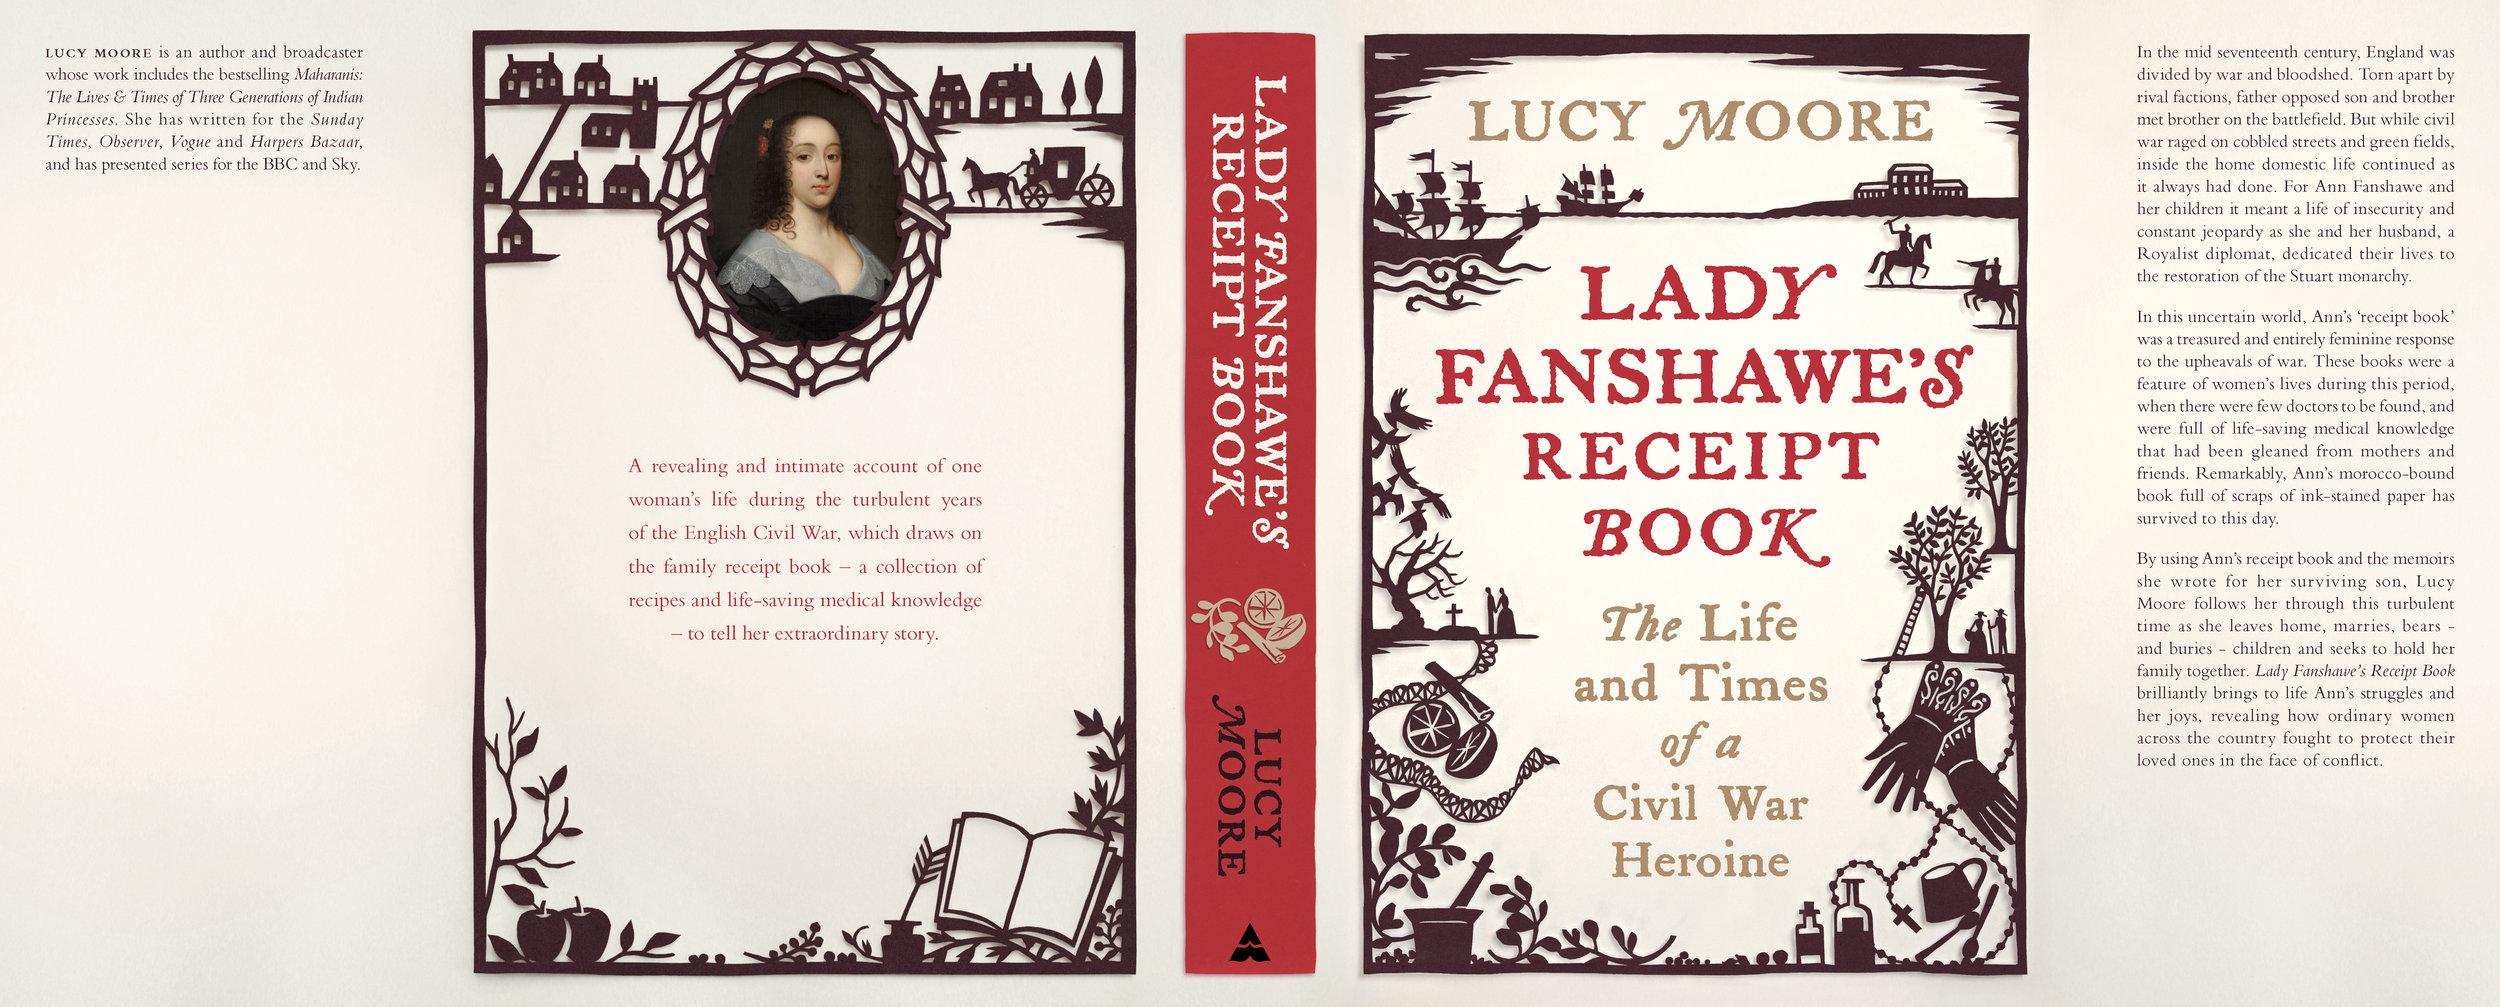 Lady Fanshawe's Receipt Book full cover.jpg